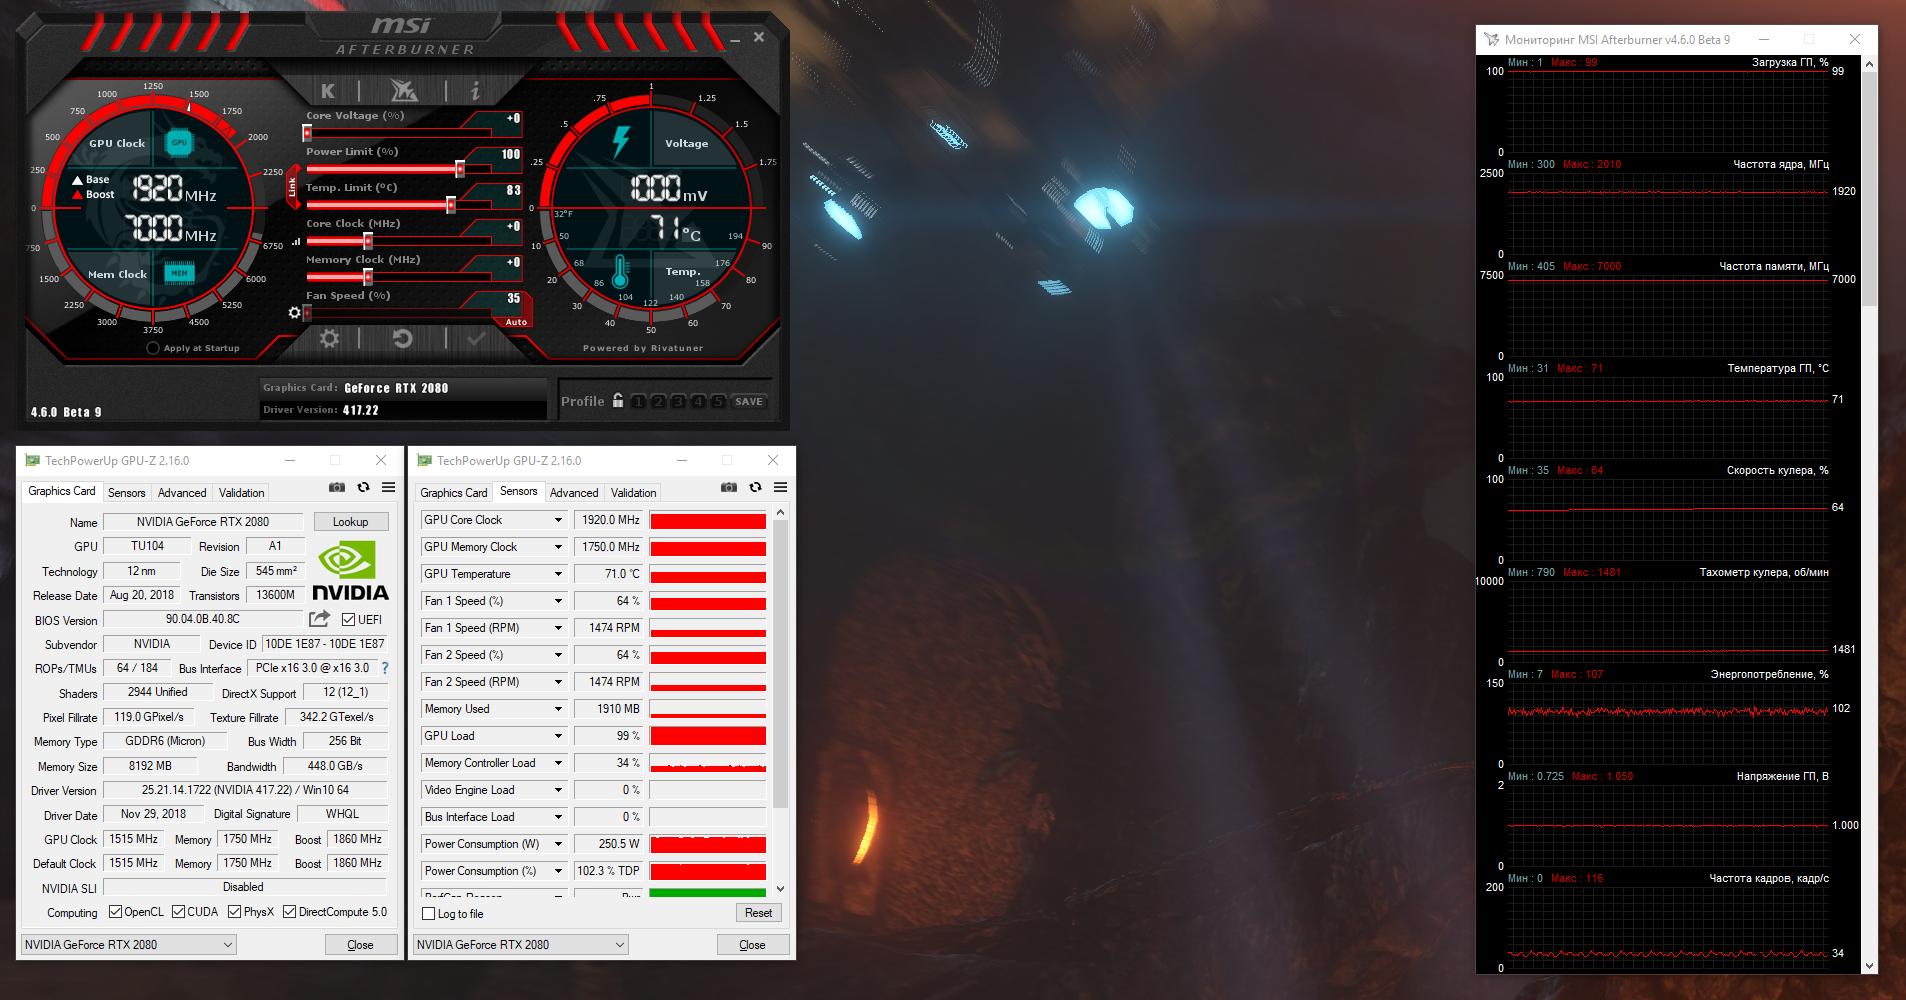 Videokarty - Obzor i test videokarty Palit GeForce RTX 2080 Super Jetstream